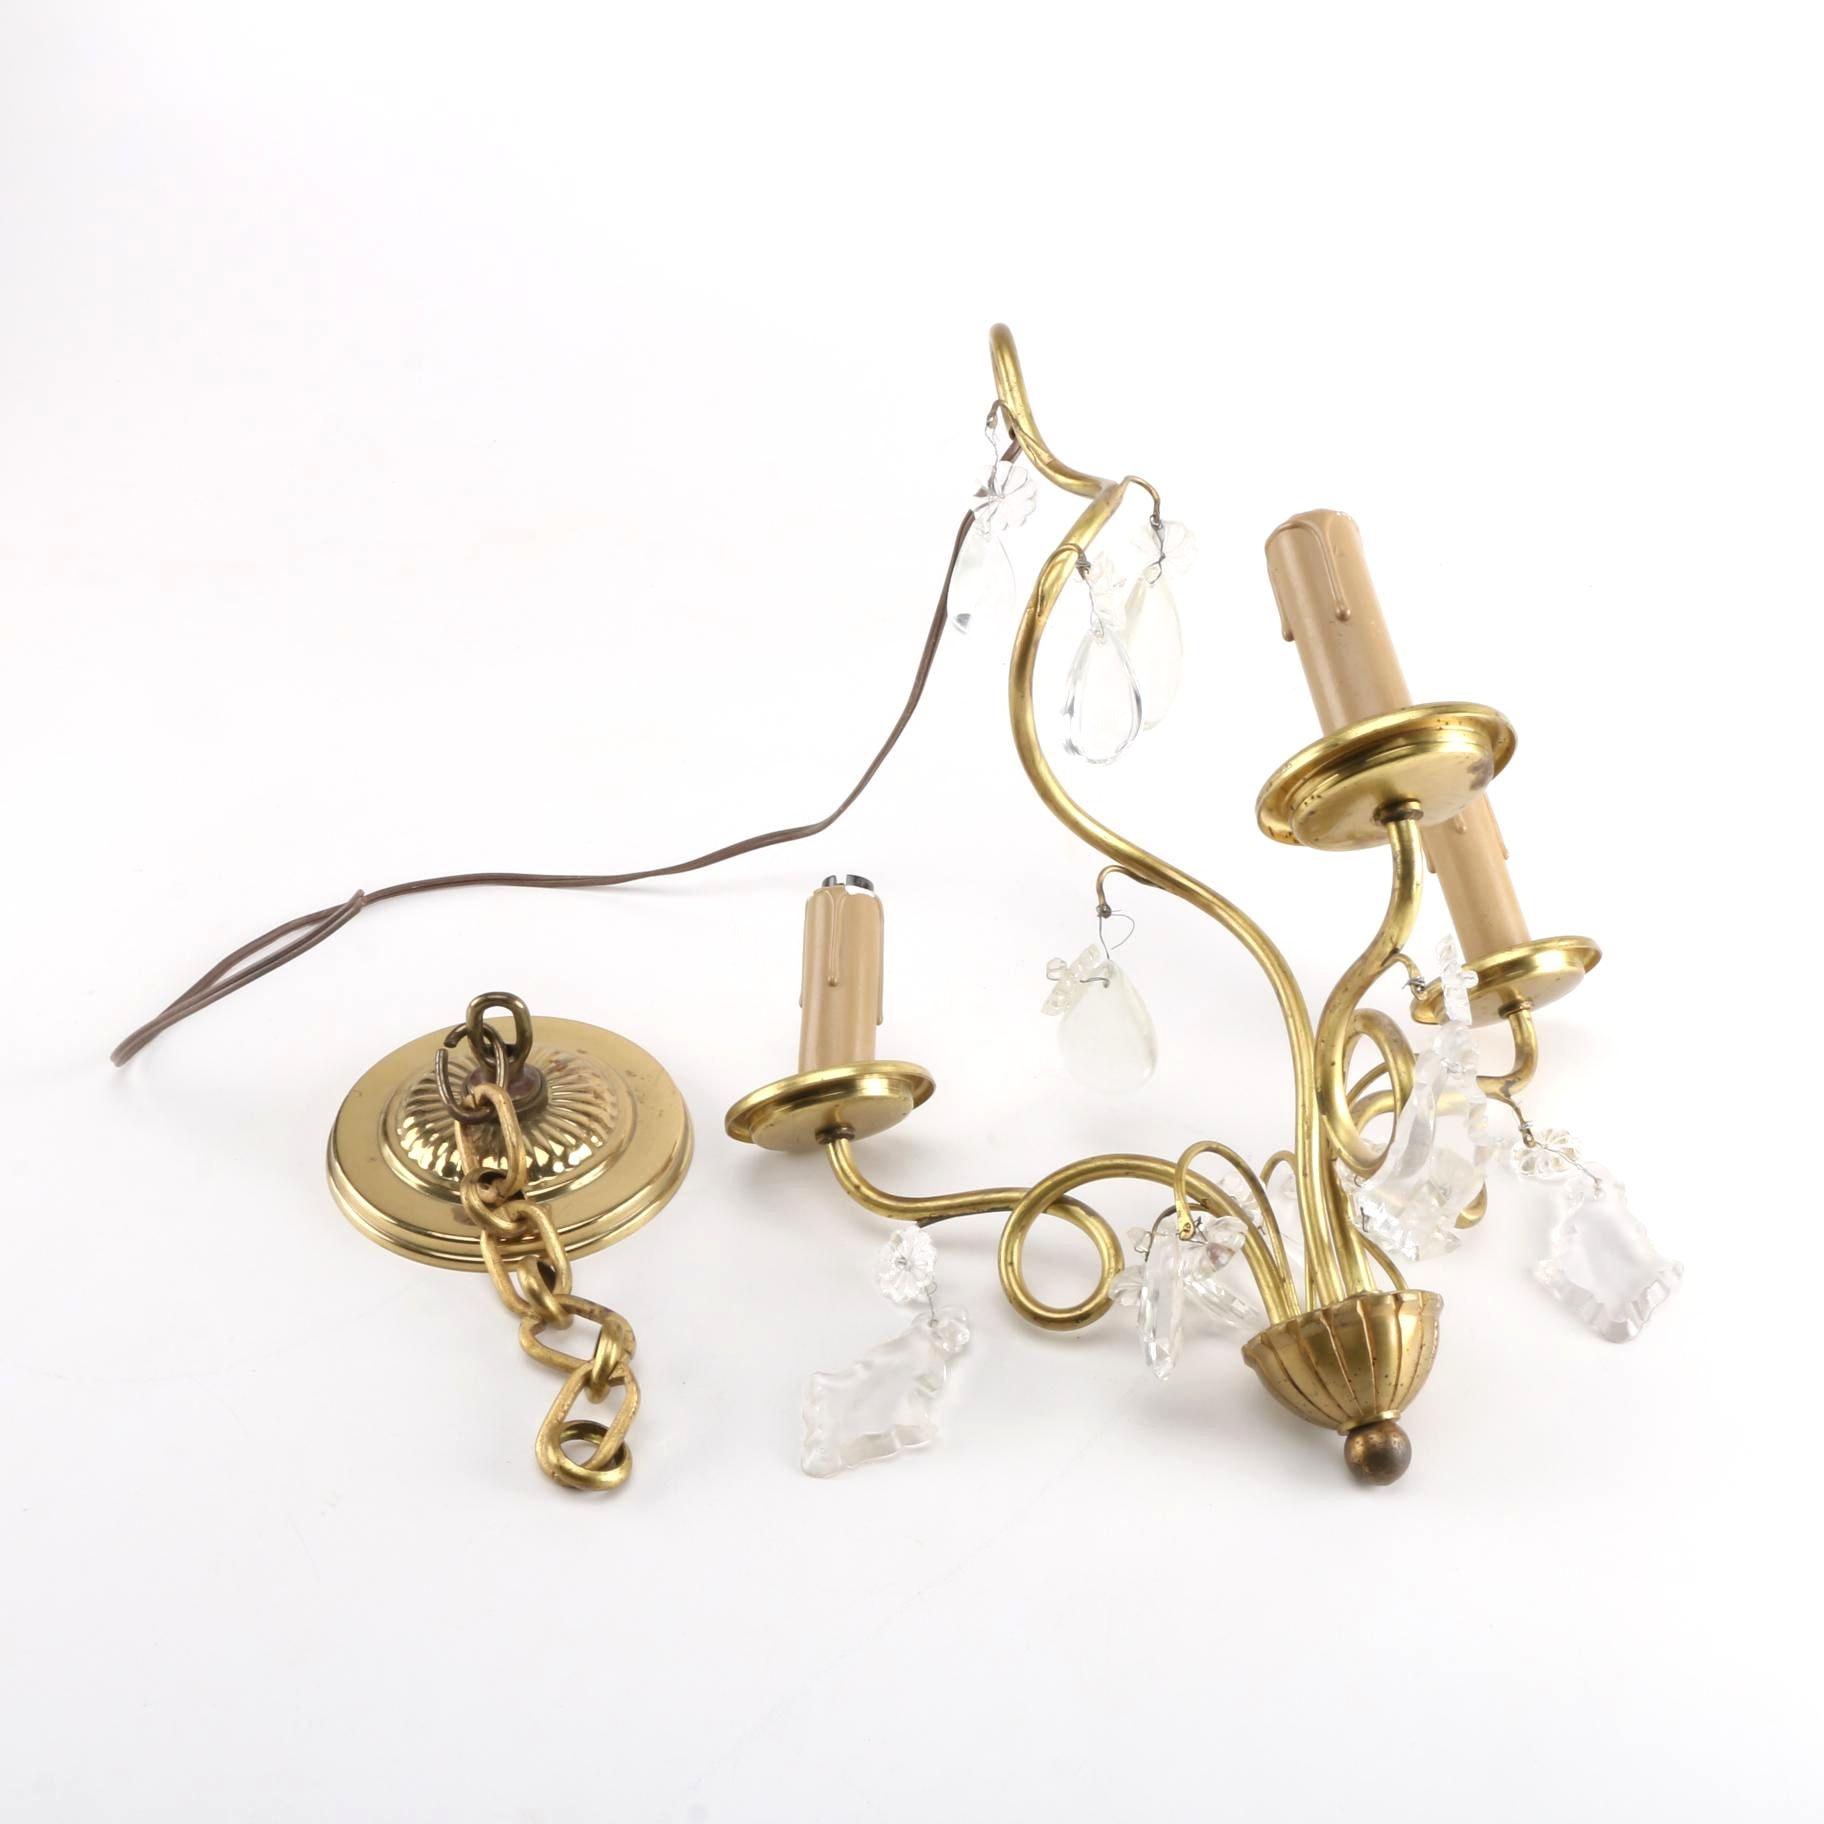 Small Brass Antique Chandelier